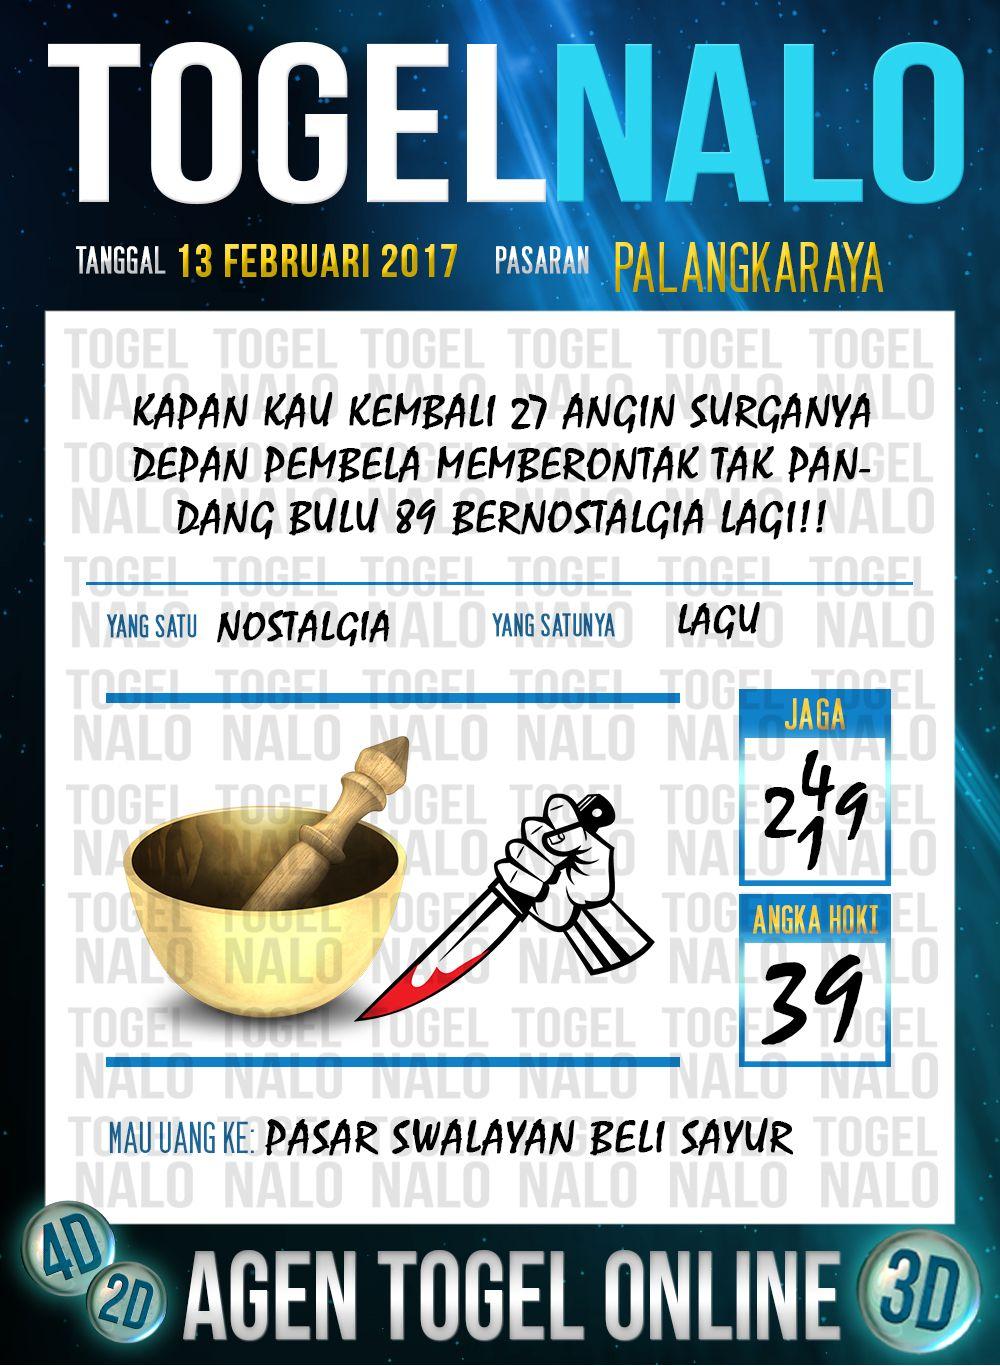 Tafsir Acak 2D Togel Wap Online Live Draw 4D TogelNalo Palangkaraya 13 Februari 2017